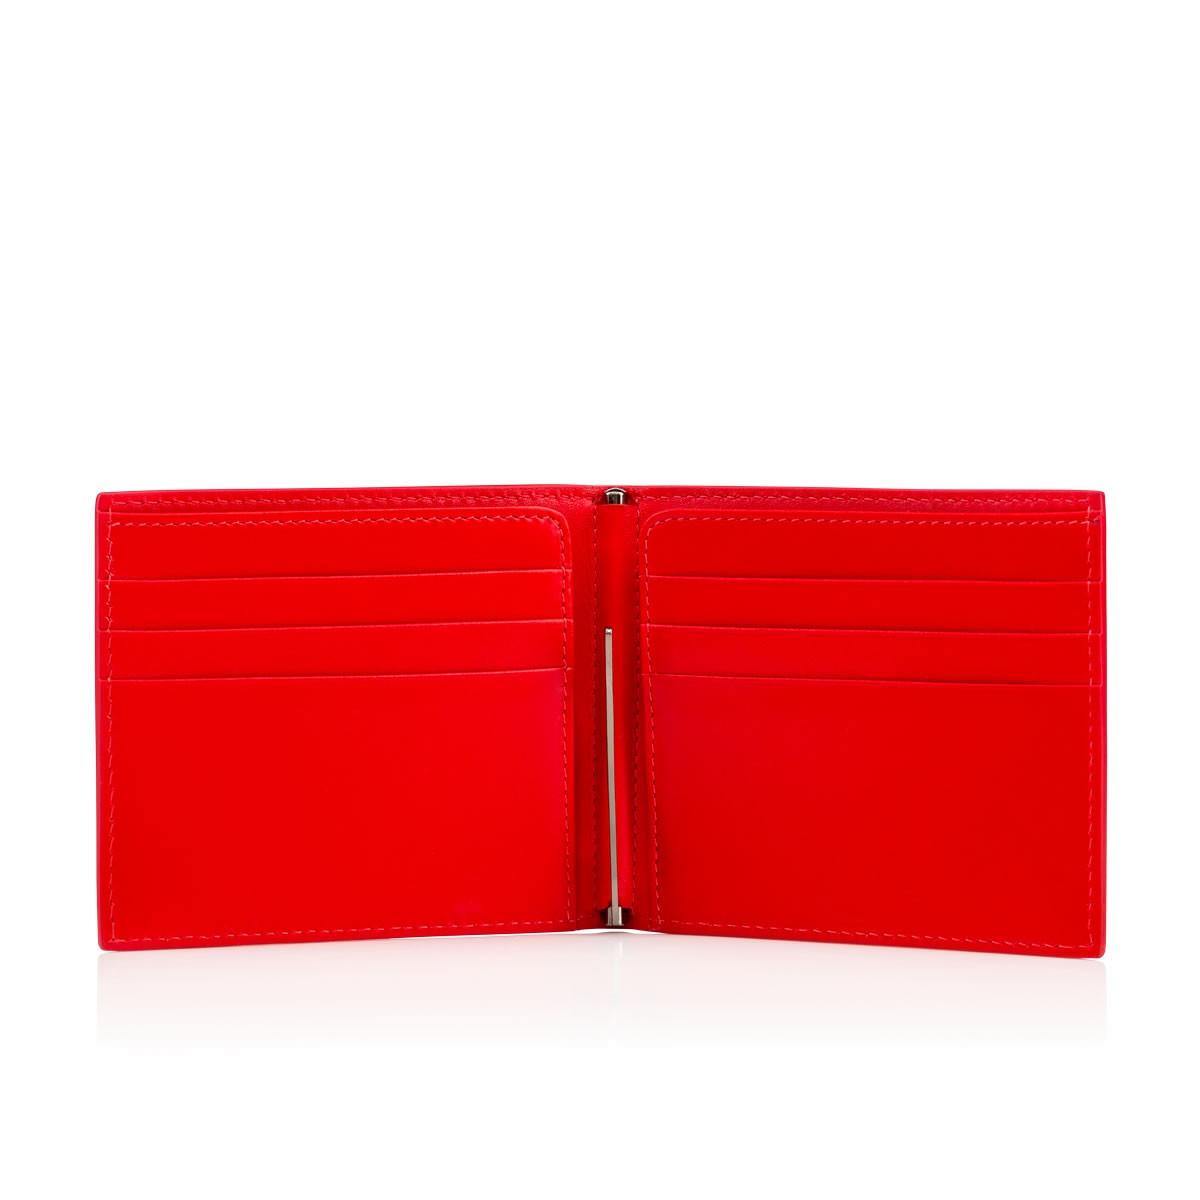 Accessoires - Kaspero Money Clip Wallet - Christian Louboutin